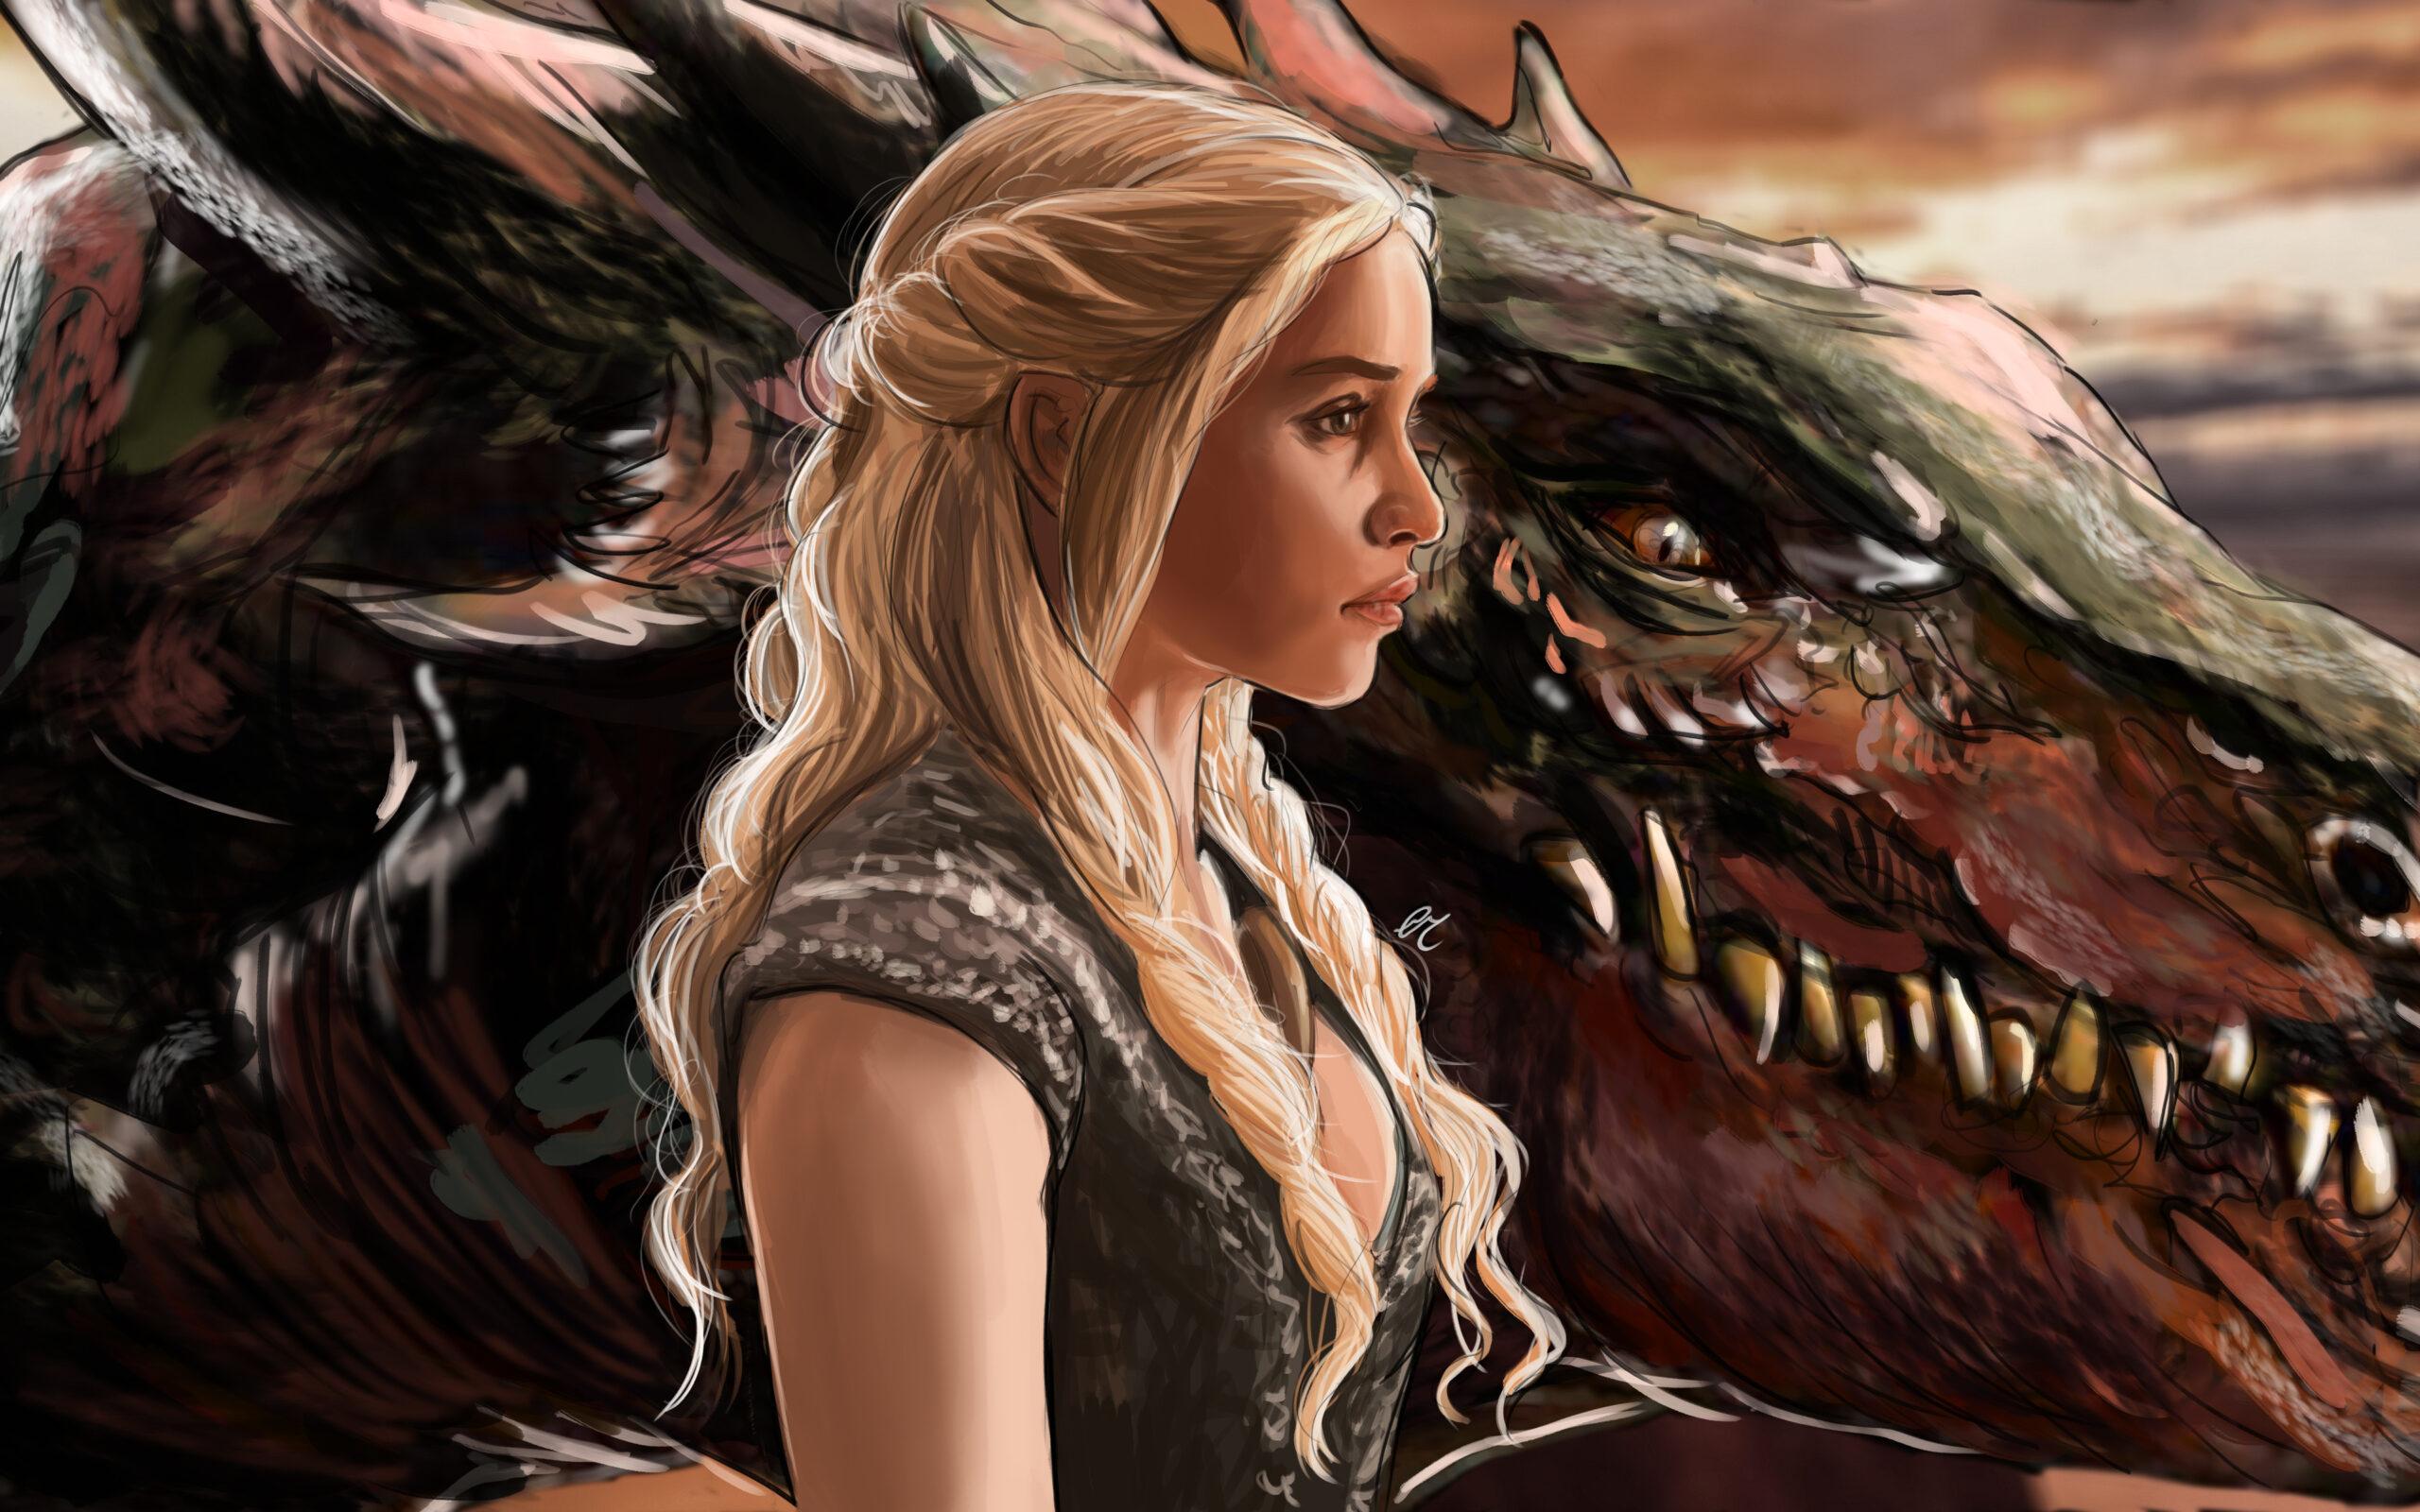 Wallpaper Daenerys Targaryen